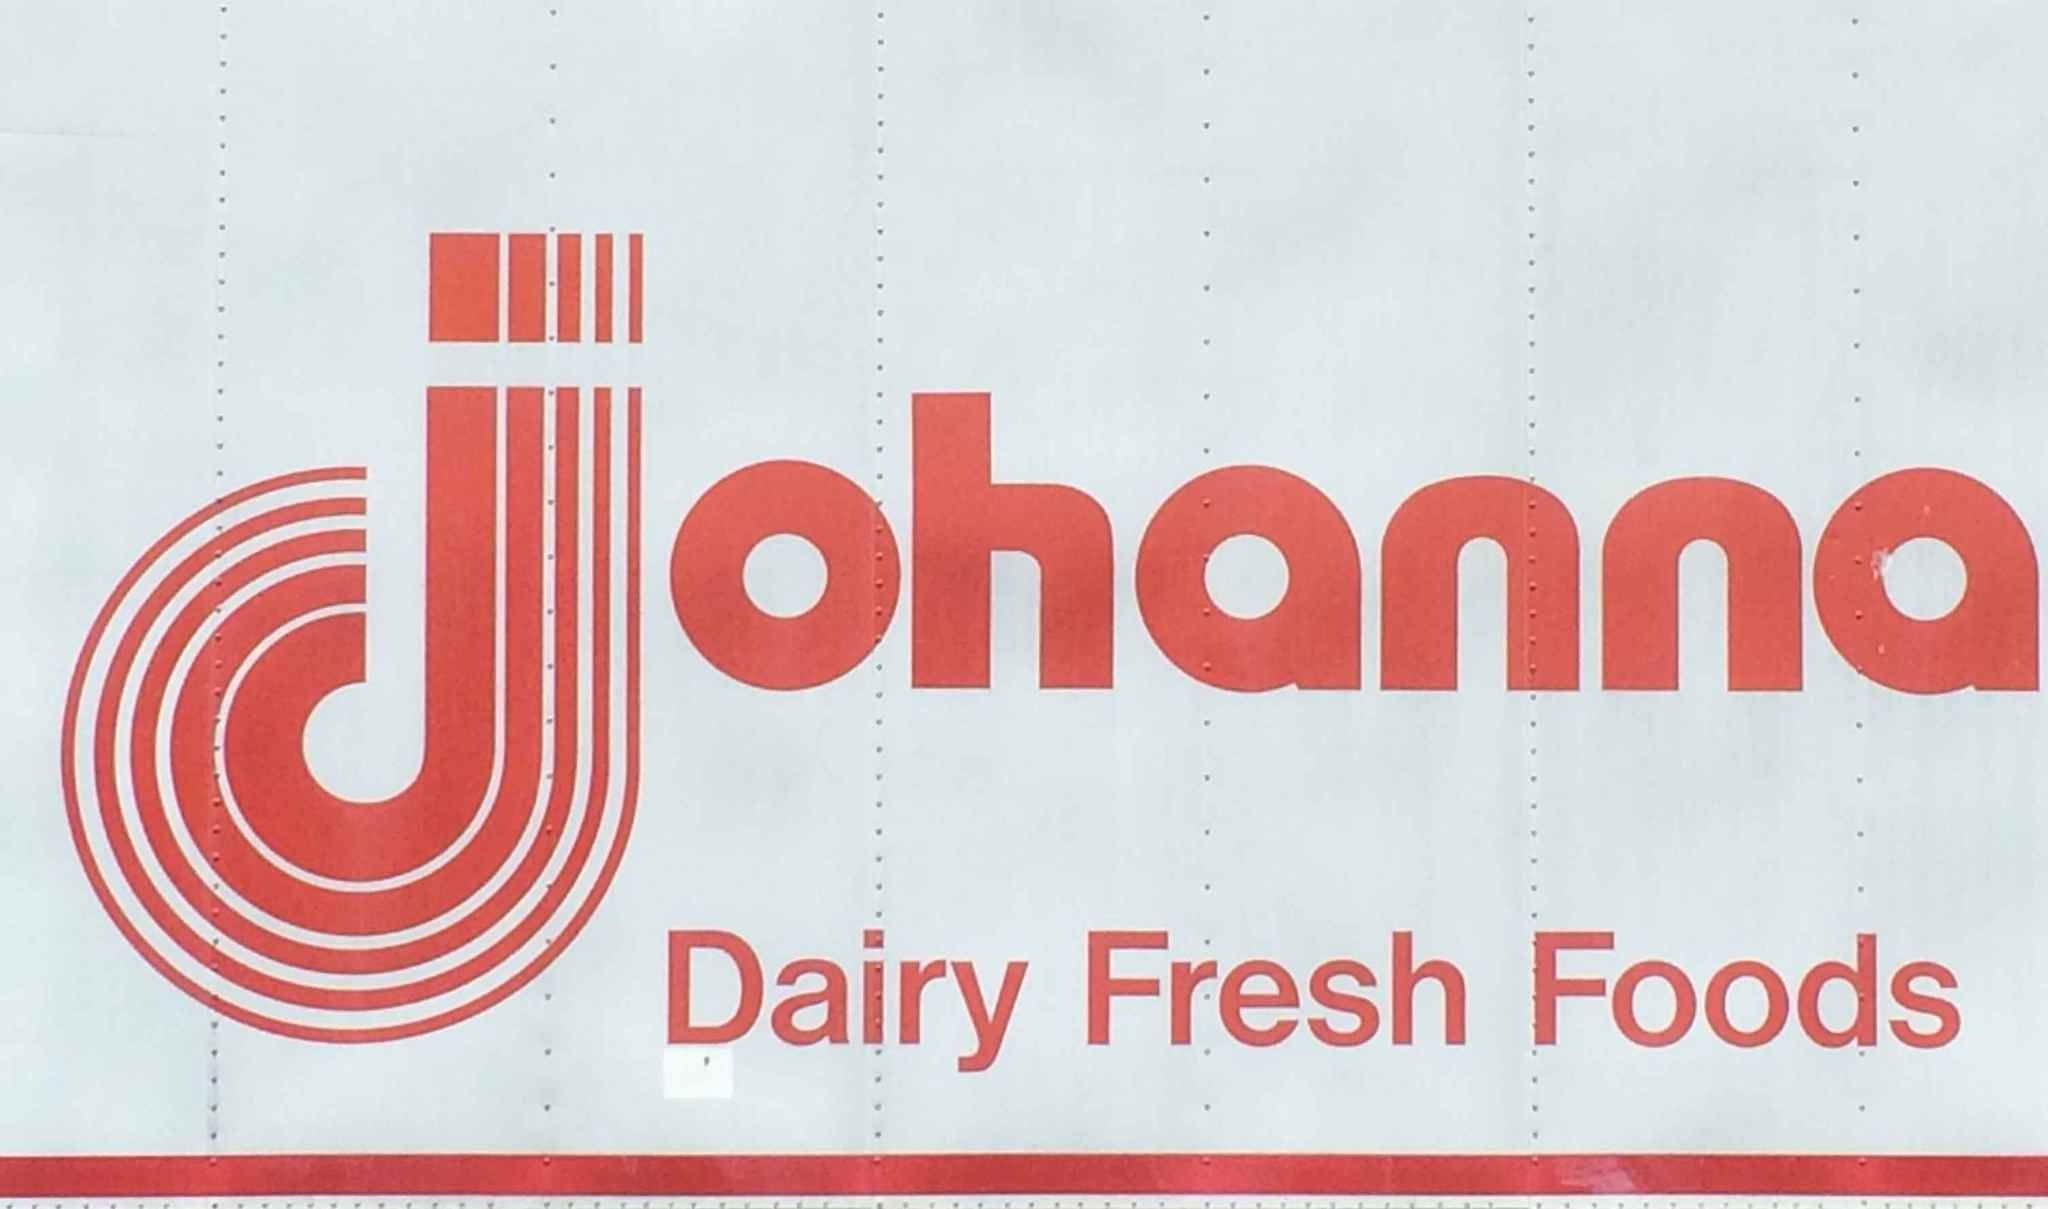 johanna-foods-trailer-2015-9443c1c5dbdaceee.jpg